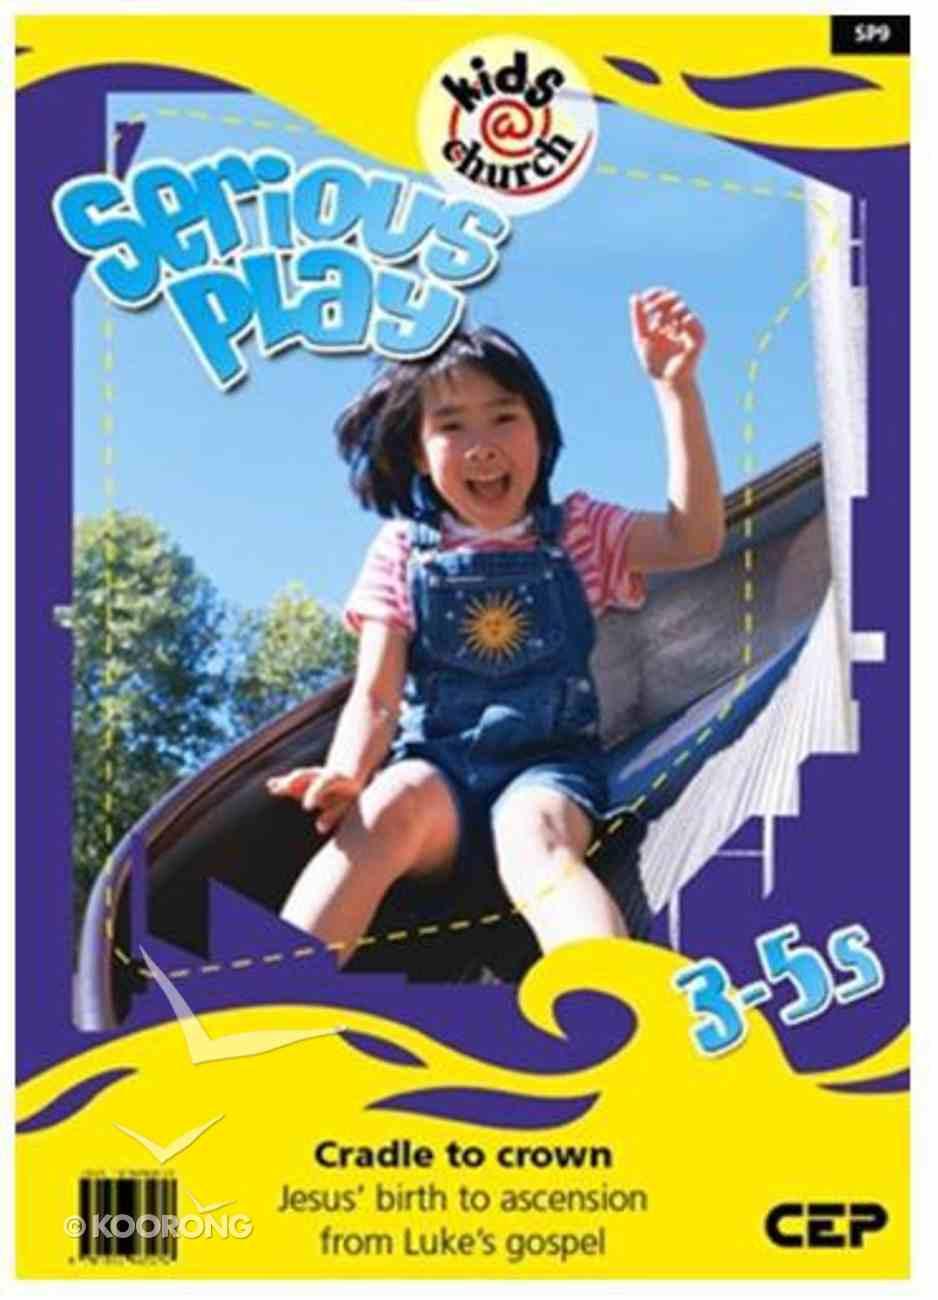 Kids@Church 09: Sp9 Ages 3-5 Teacher's Manual (Serious Play) (Kids@church Curriculum Series) Spiral